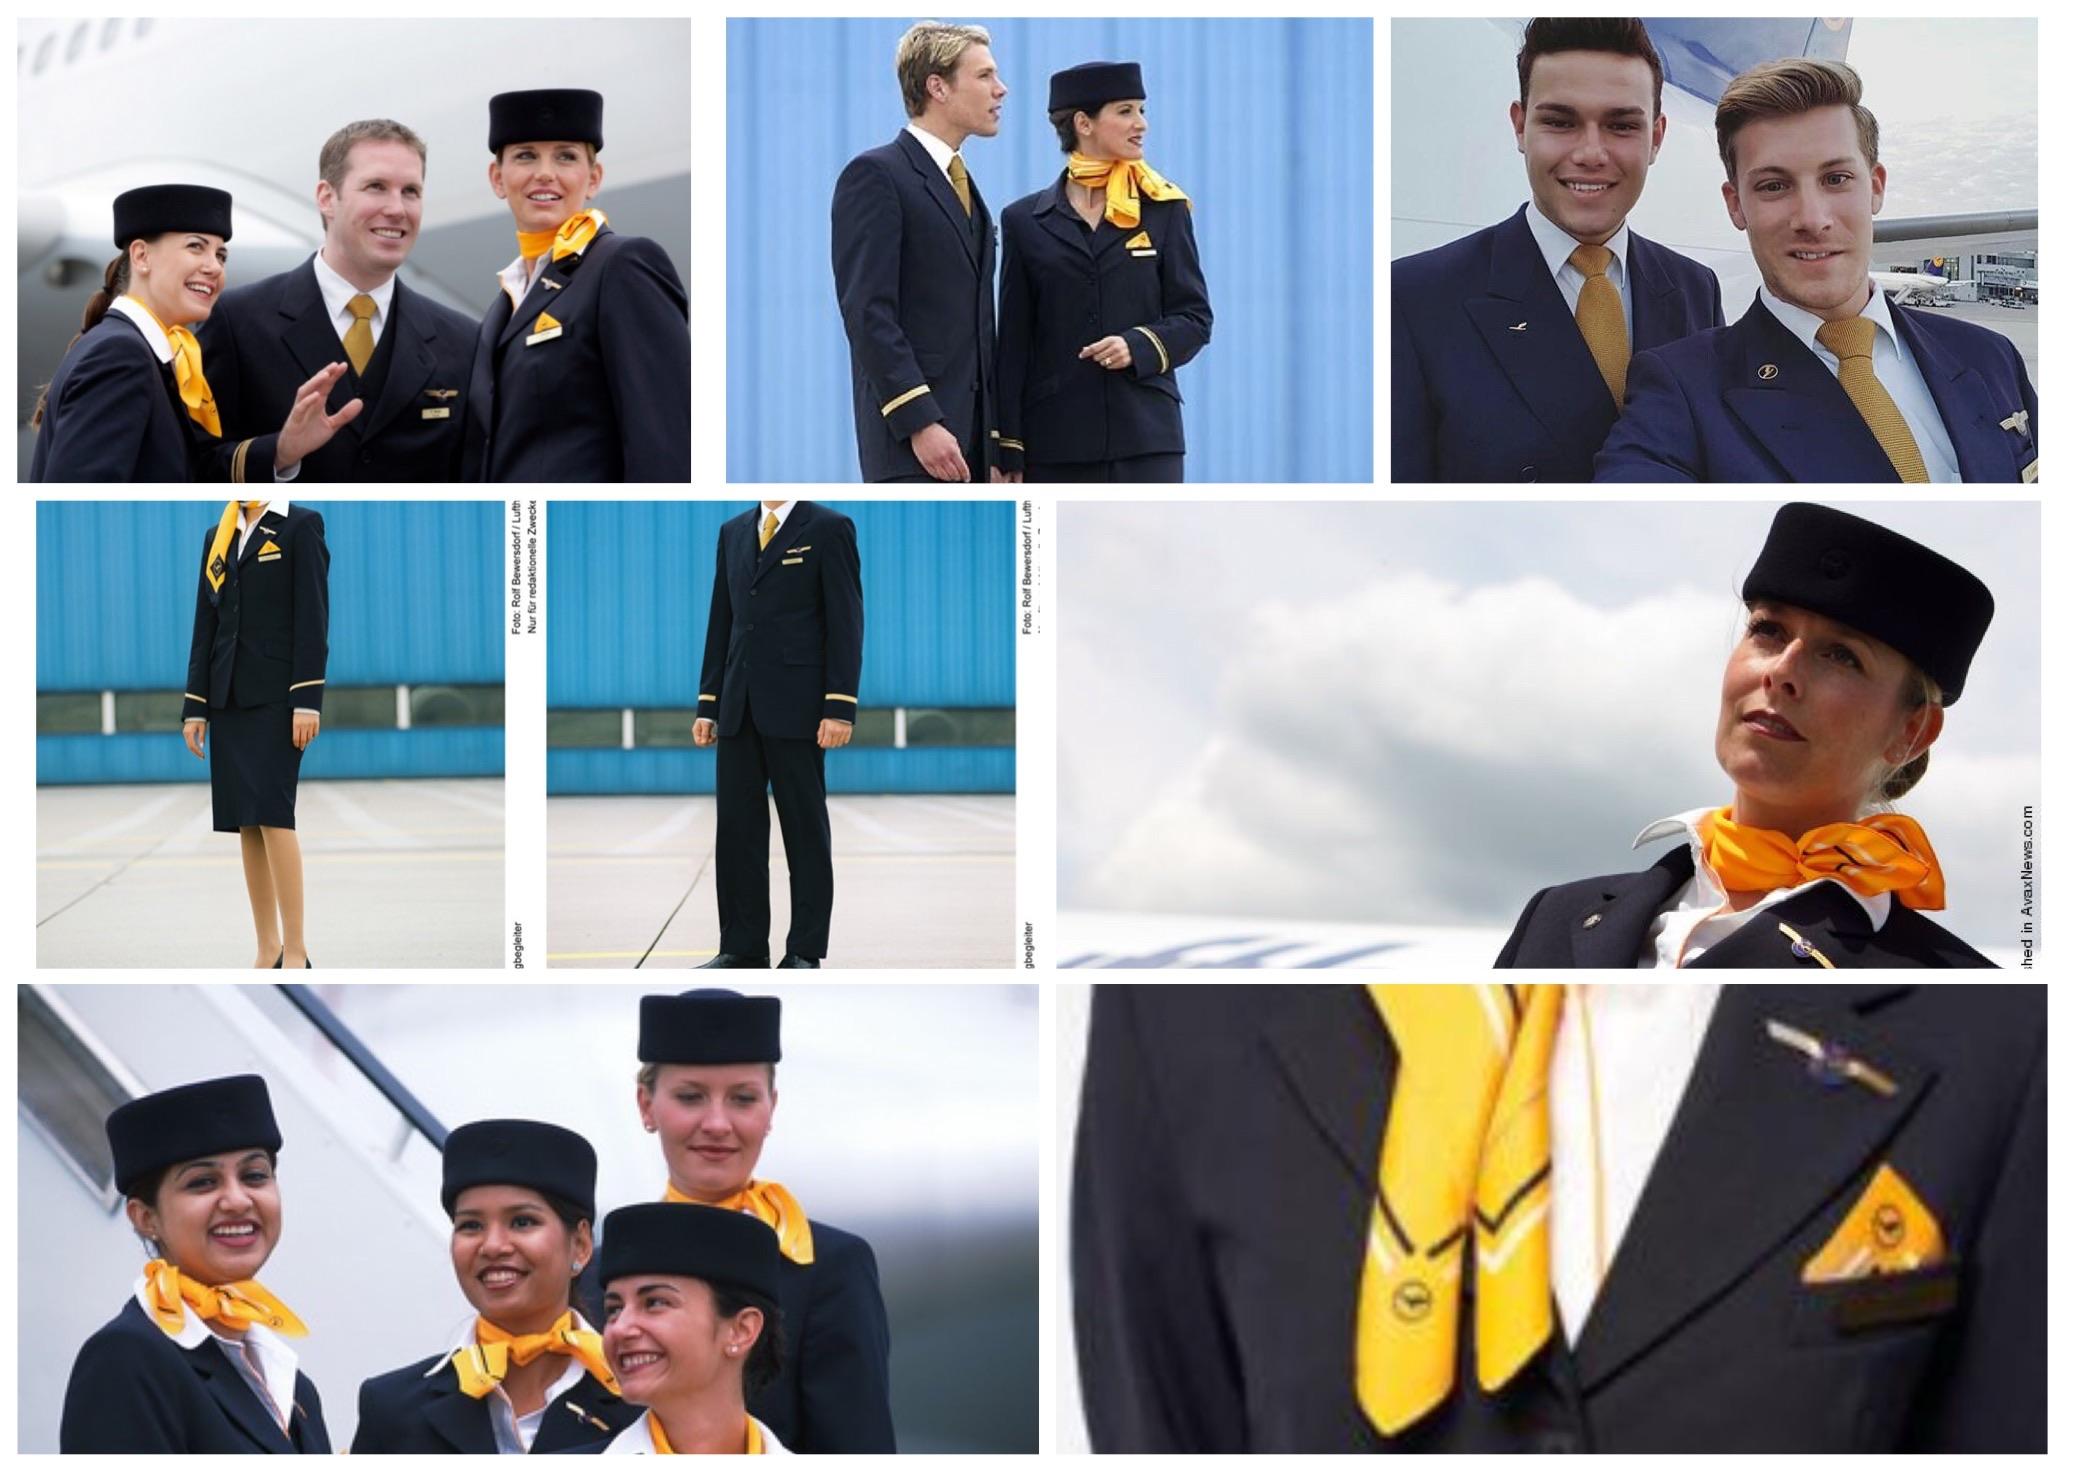 Lufthansa SITA 2017